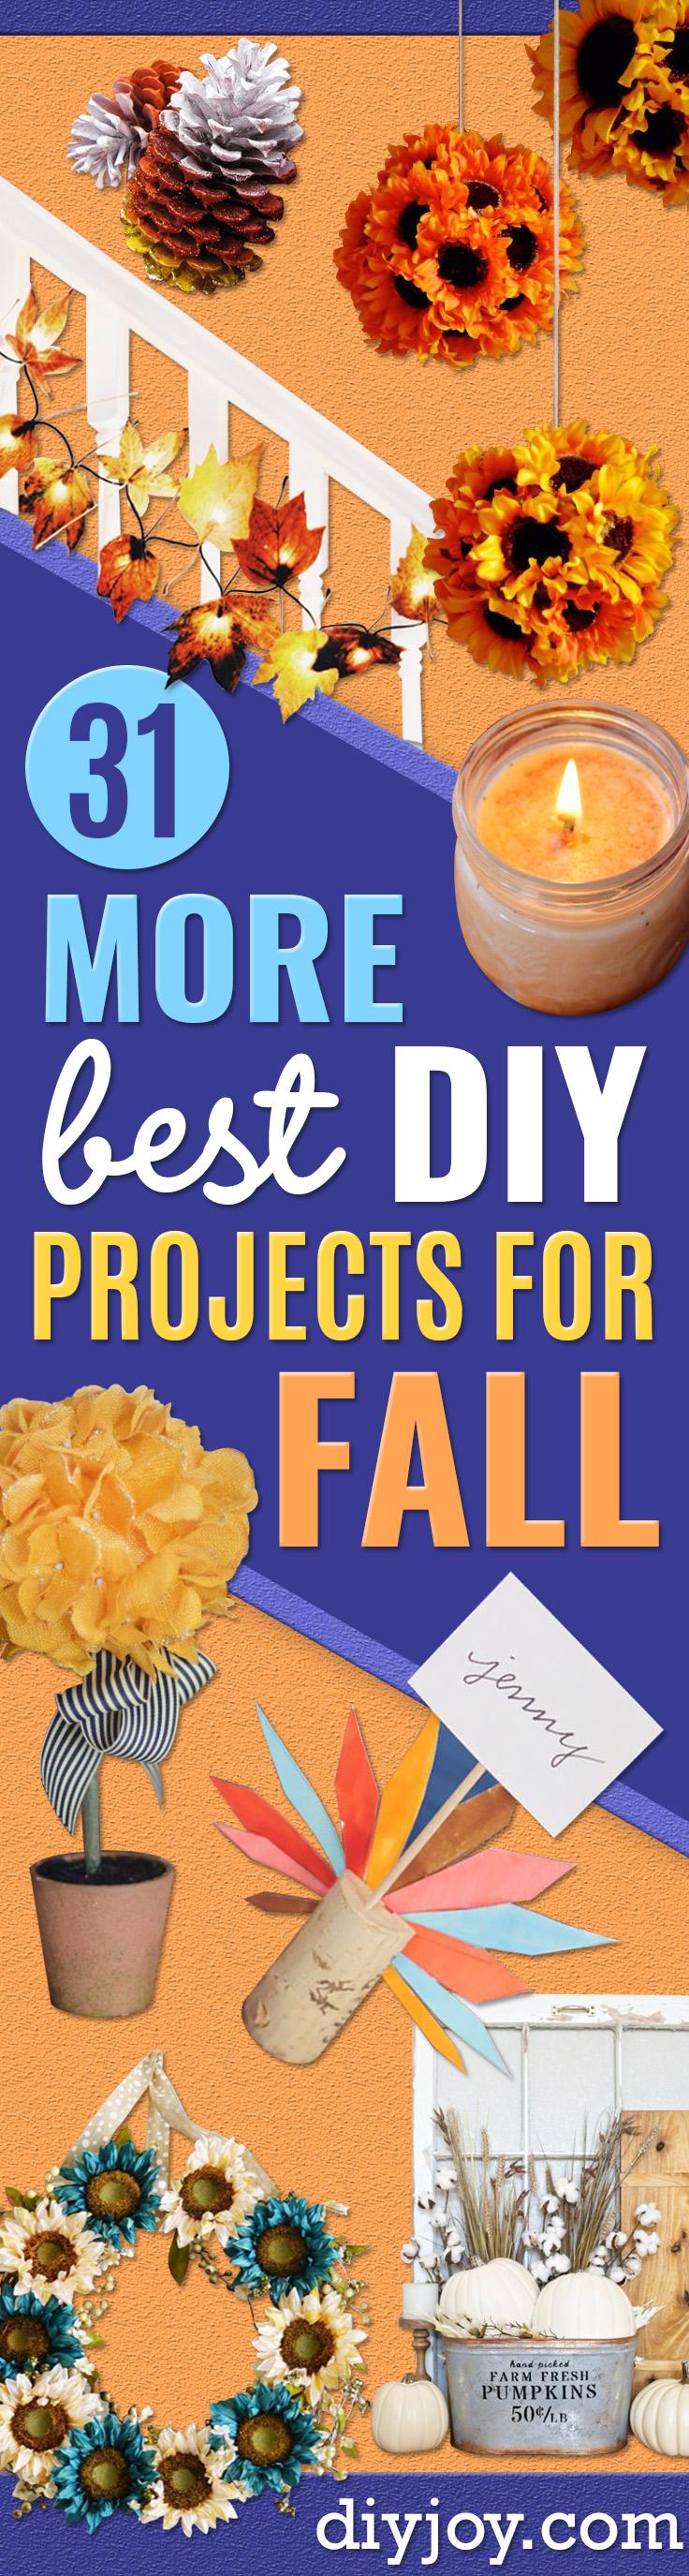 Fall Crafts Ideas - DIY Fall Decor Projects - Autumn Decorating - Easy Mason Jar Idea, Dollar Store Crafts, Rustic Pumpkin Ideas, Wreaths, Candles and Wall Art, Centerpieces